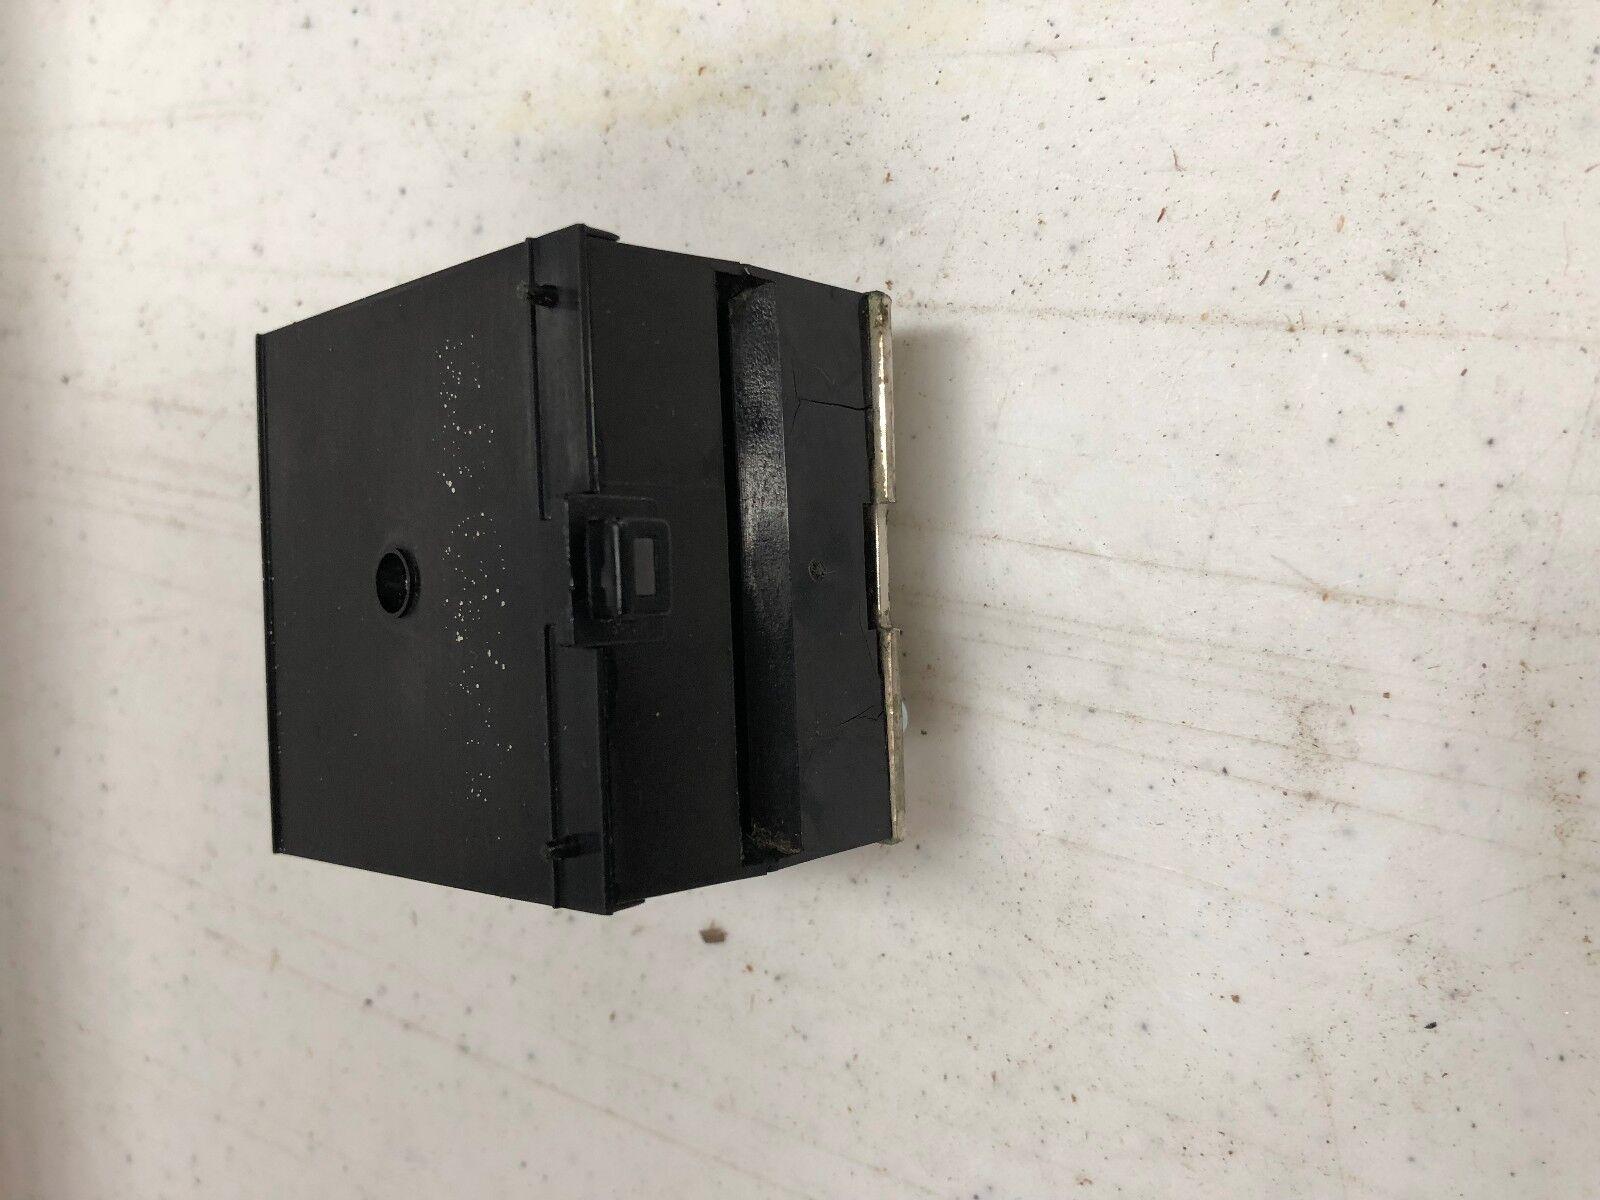 Vingcard 2100 Encoder Parts | Wallpaperletter co